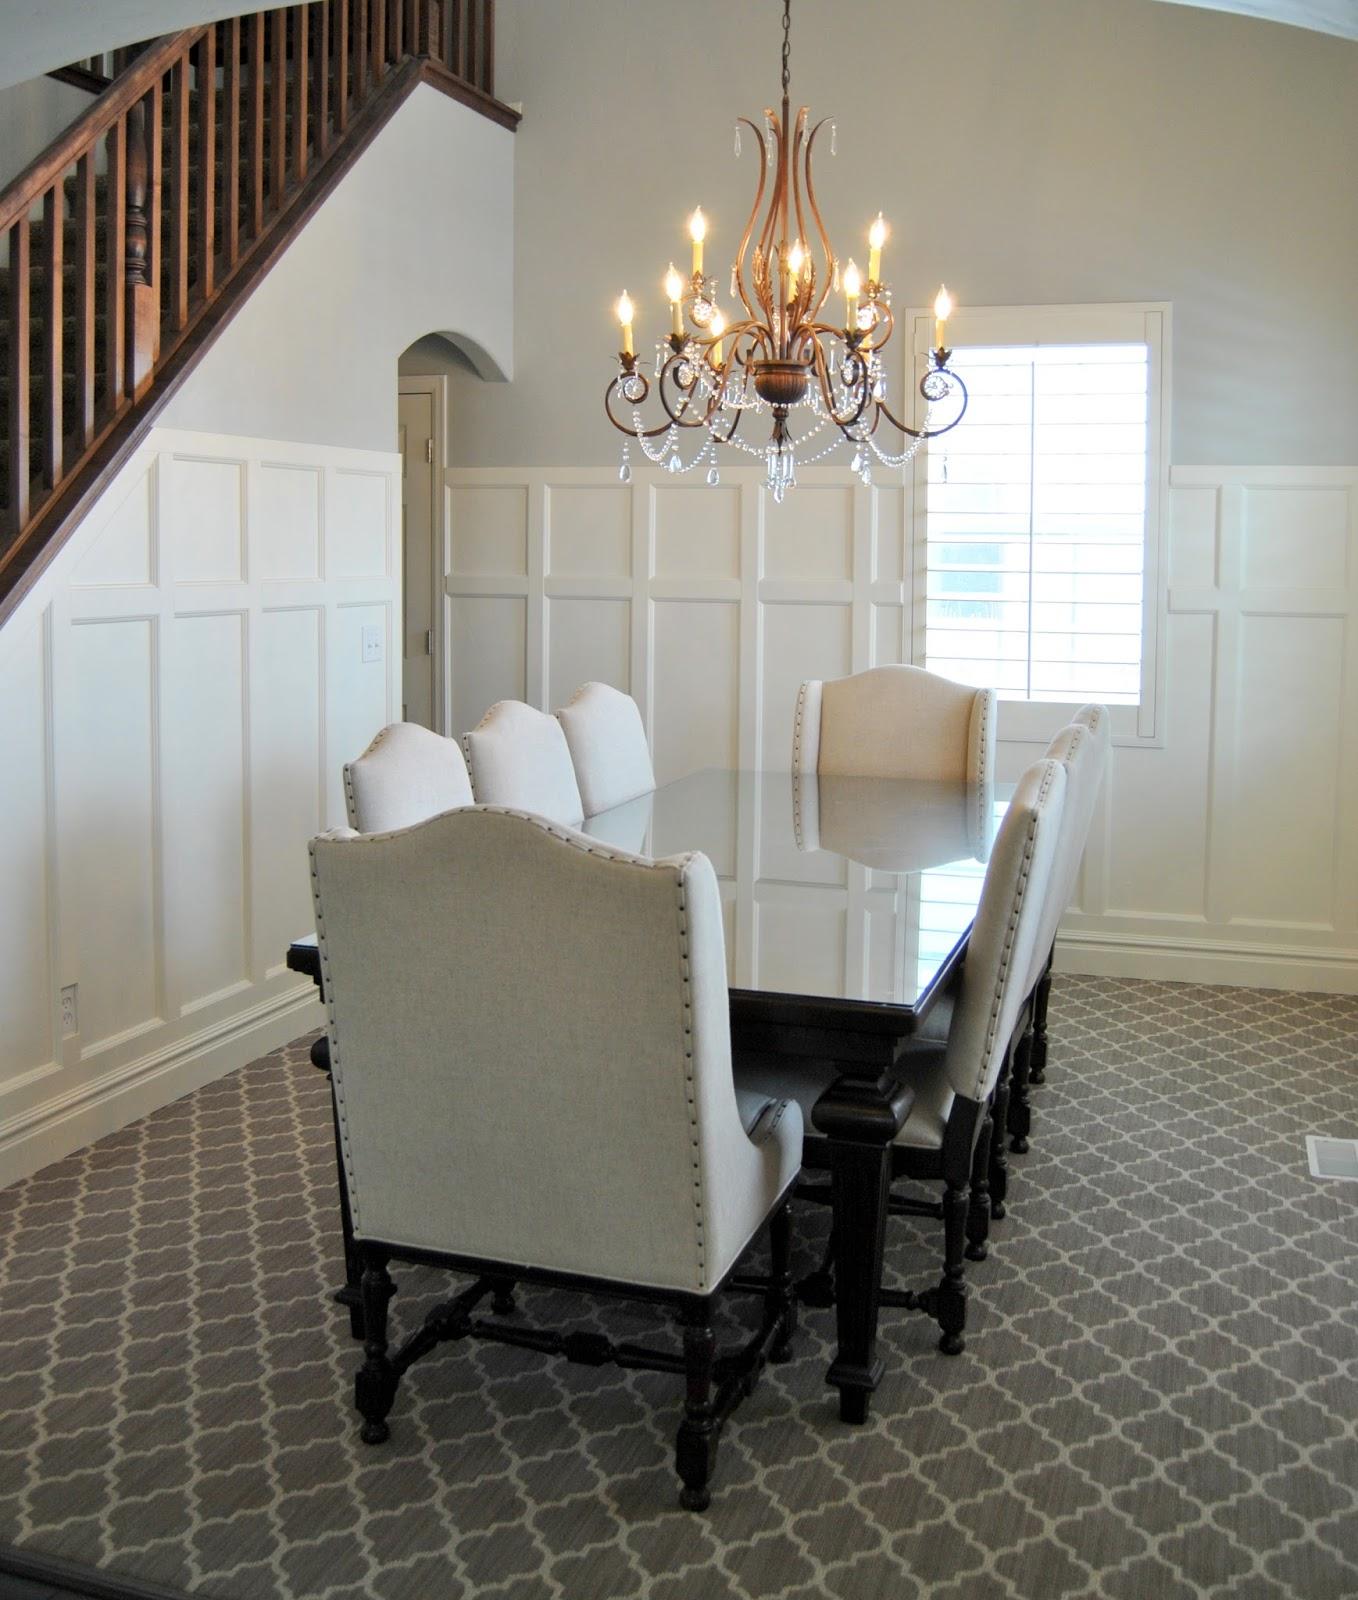 Chandelier Dining Room Board And Batten